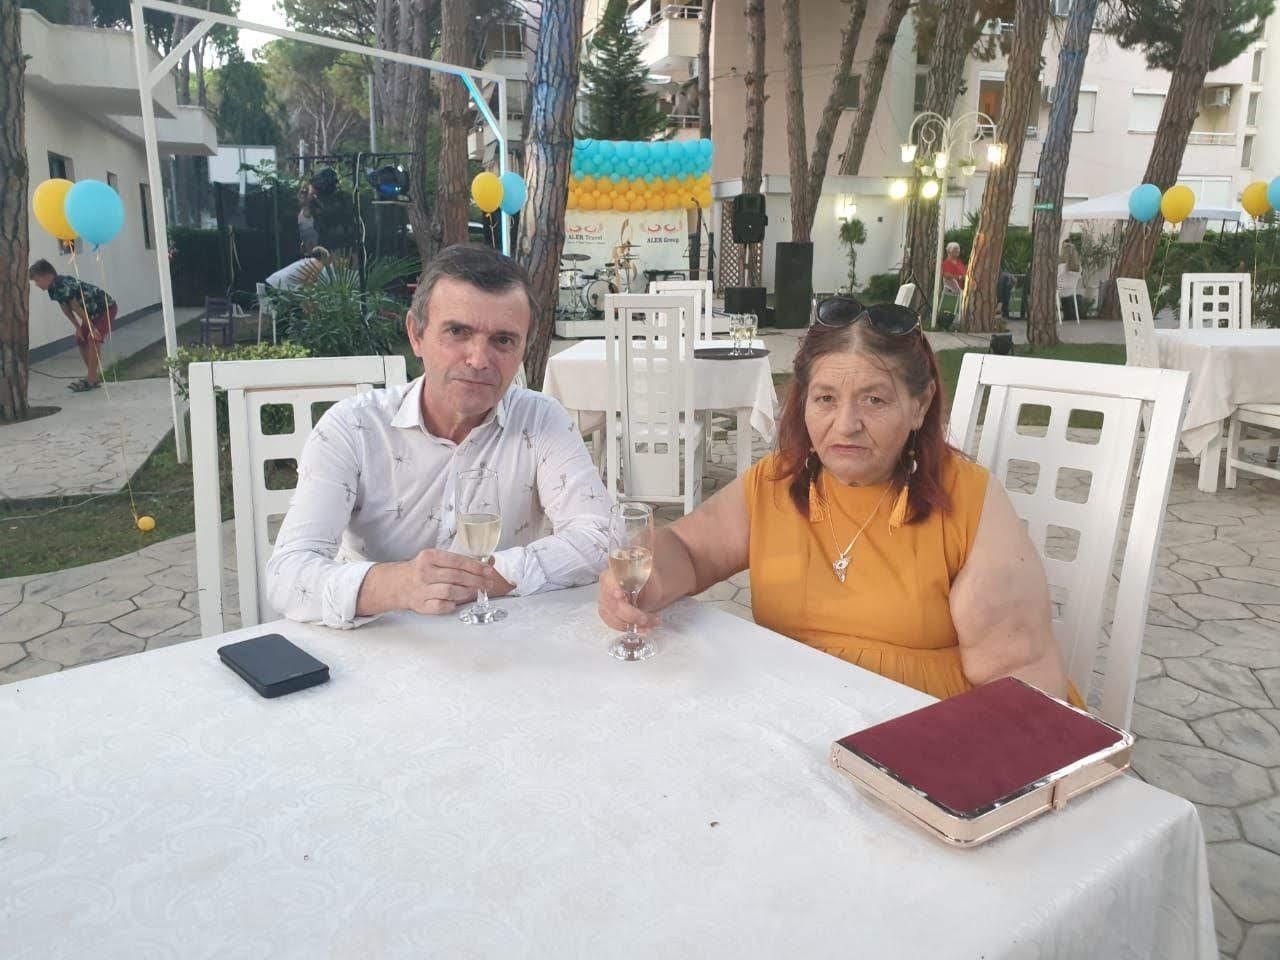 Agron Haxhihyseni, pictured with his wife ©Agron Haxhihyseni